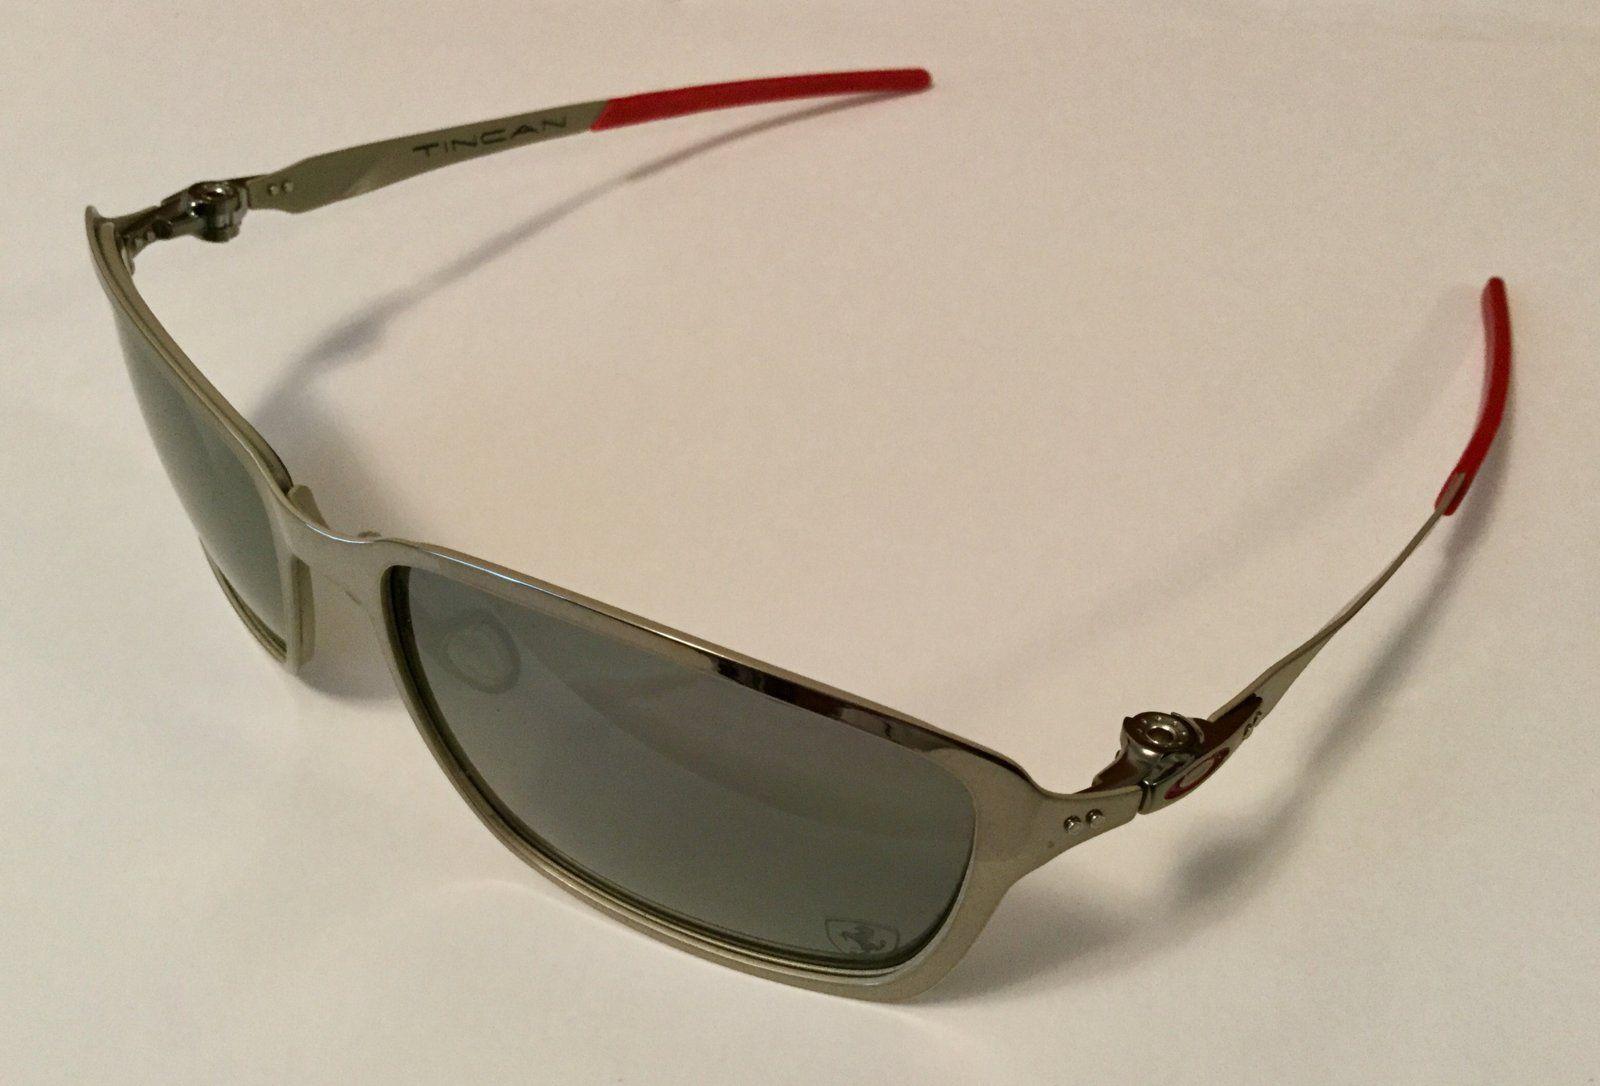 c0b1fa7218 Oakley Scuderia Ferrari TinCan Sunglasses (New) - 7C4ED82C-F769-4C7B-A397